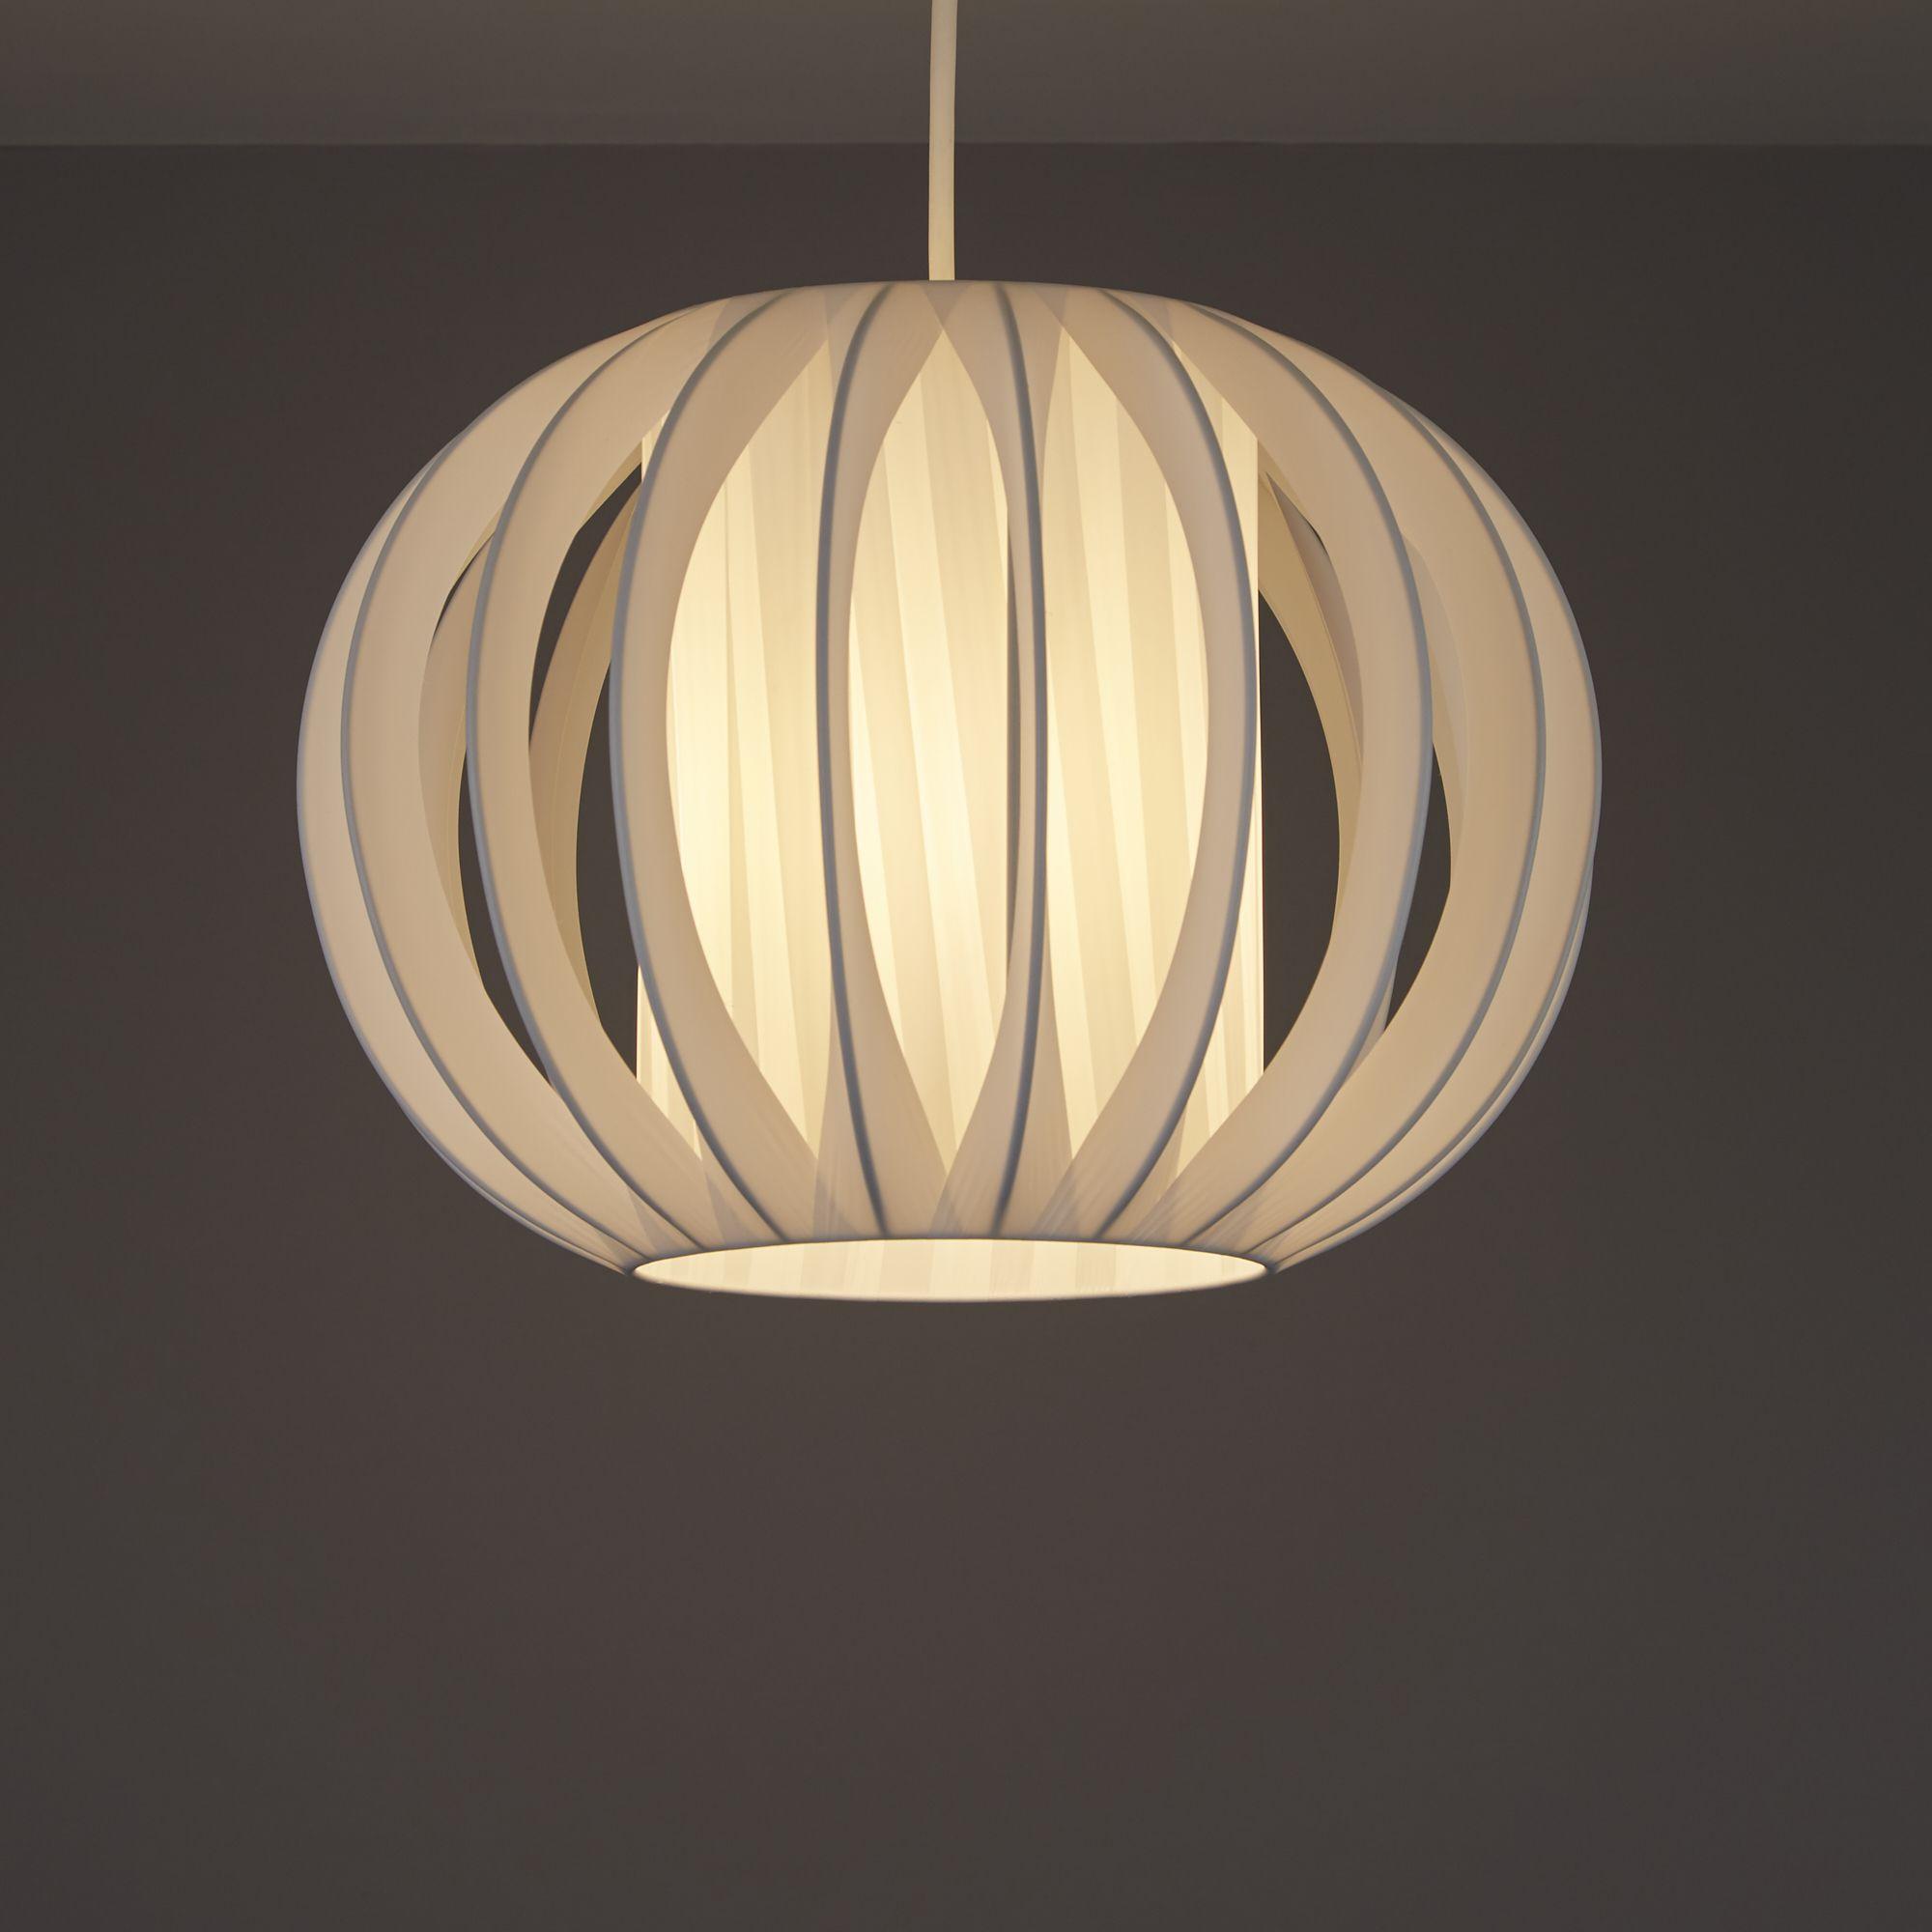 White Side Pleat Onion Light Shade D 320mm